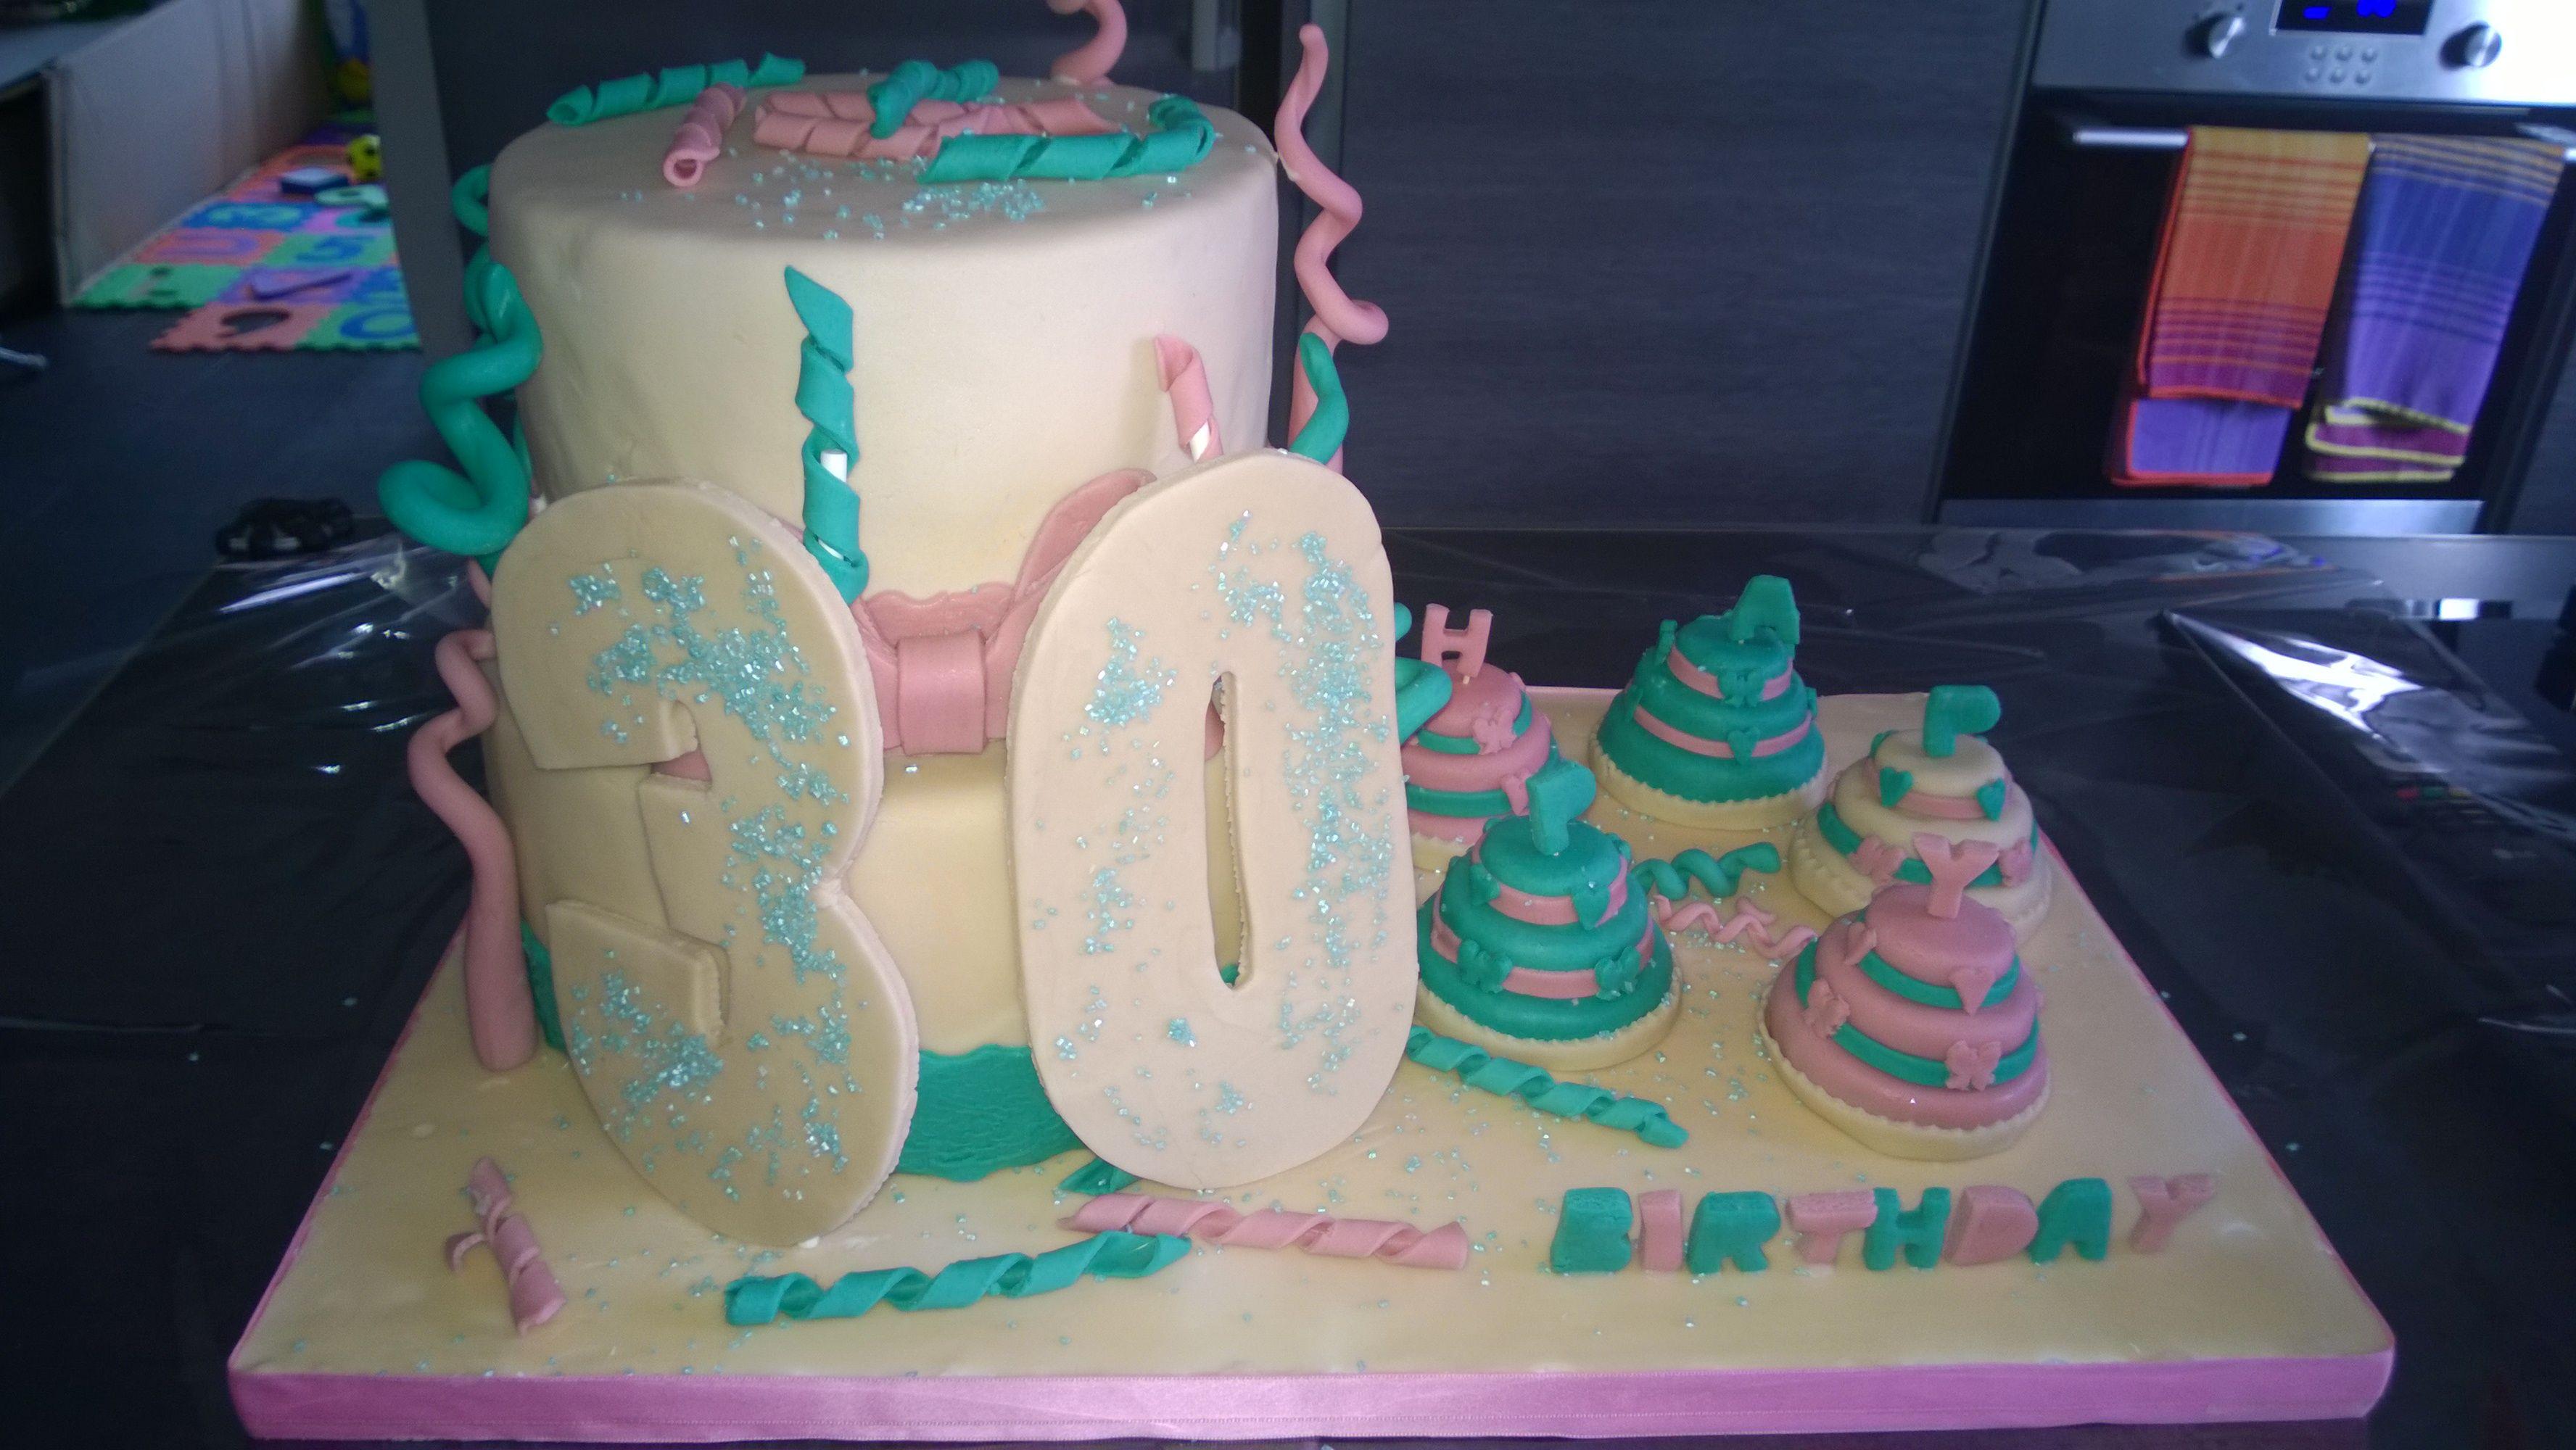 Cake birthday, Tiffany, Pink, avorio, verde, rosa, fiocco, ribbon, coriandoli, ghirigori, torta due piani, mini cakes, cuori, 30, pdz, pasta di zucchero, fondent, mmf